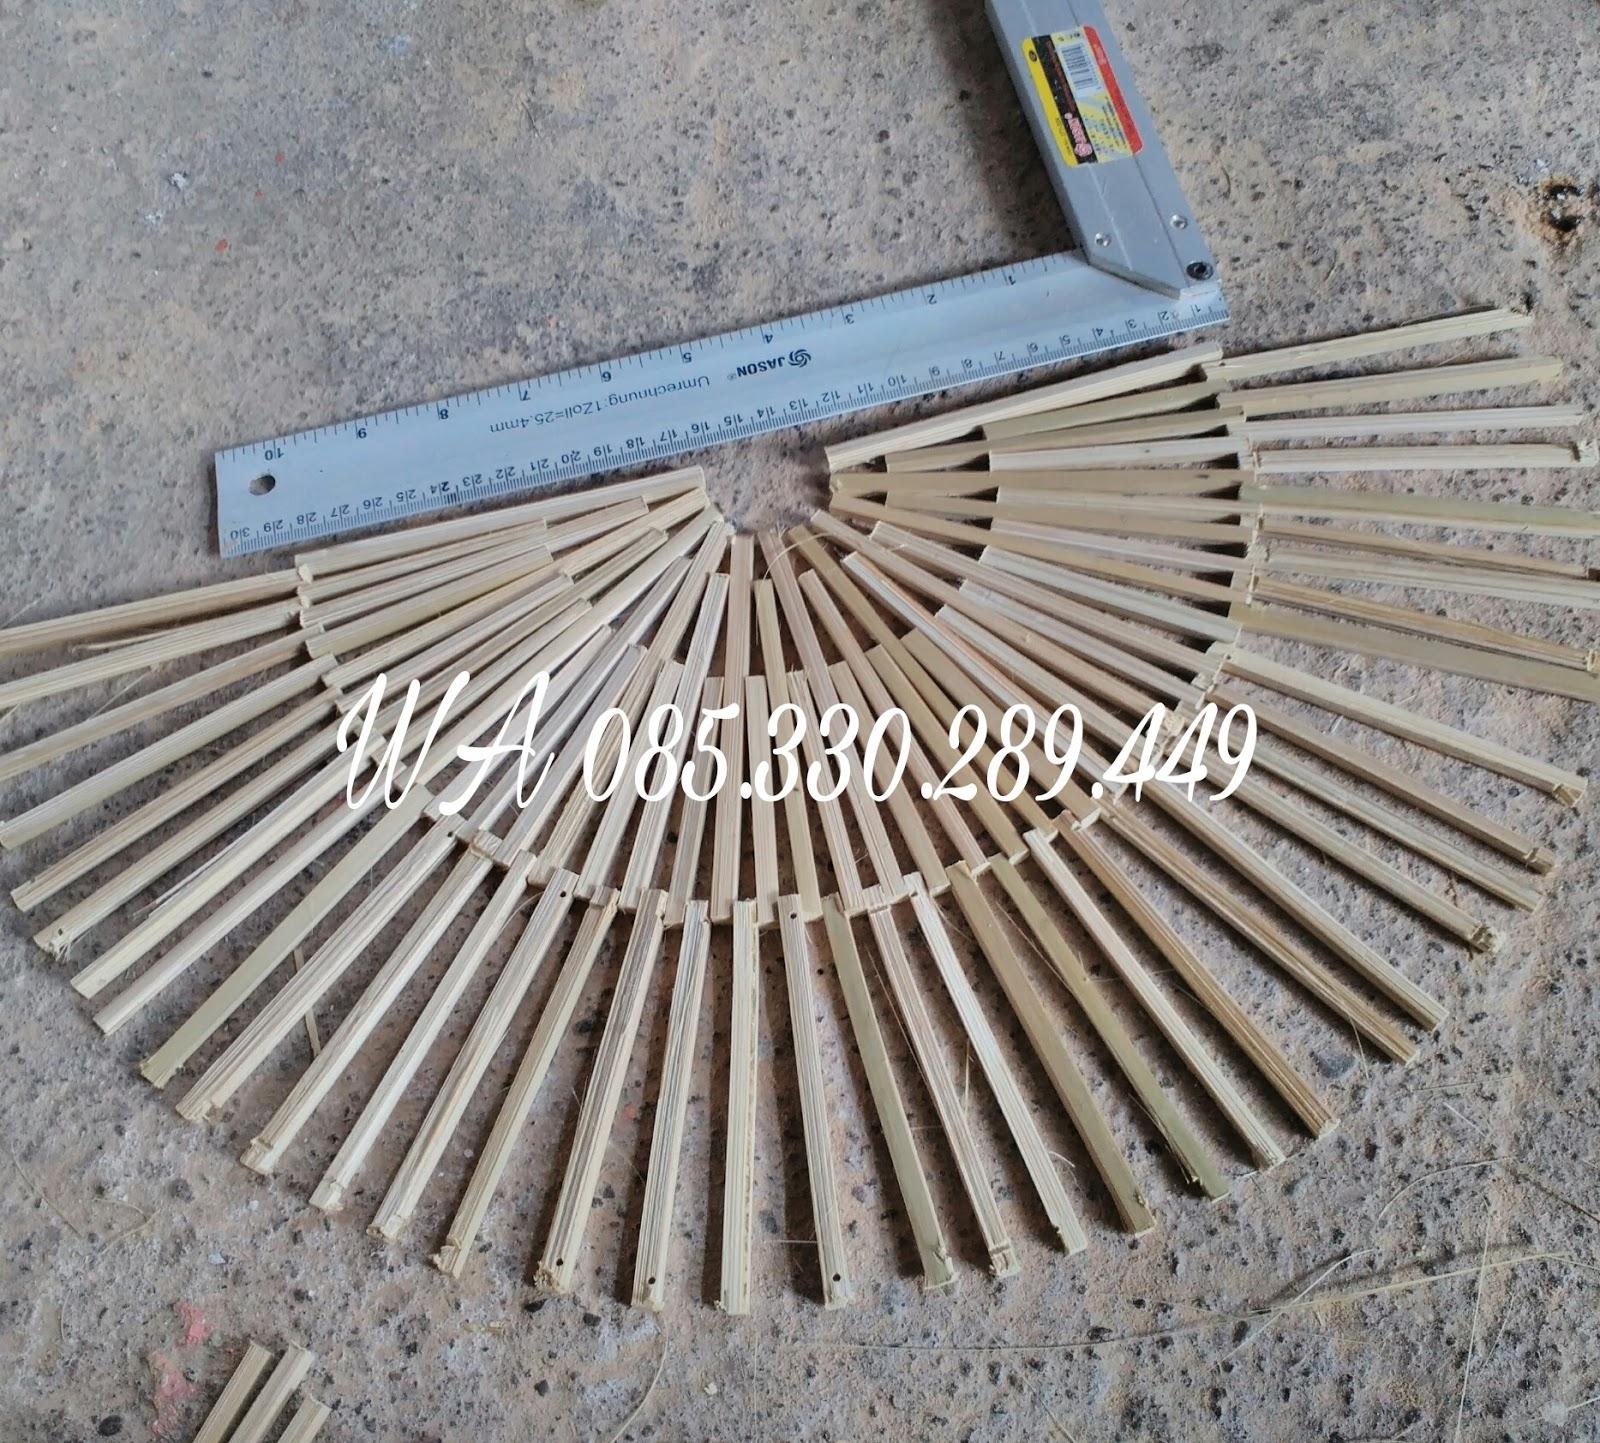 Kerajinan Souvenir Dari Kayu Limbah: Bambu Kreatif Desain